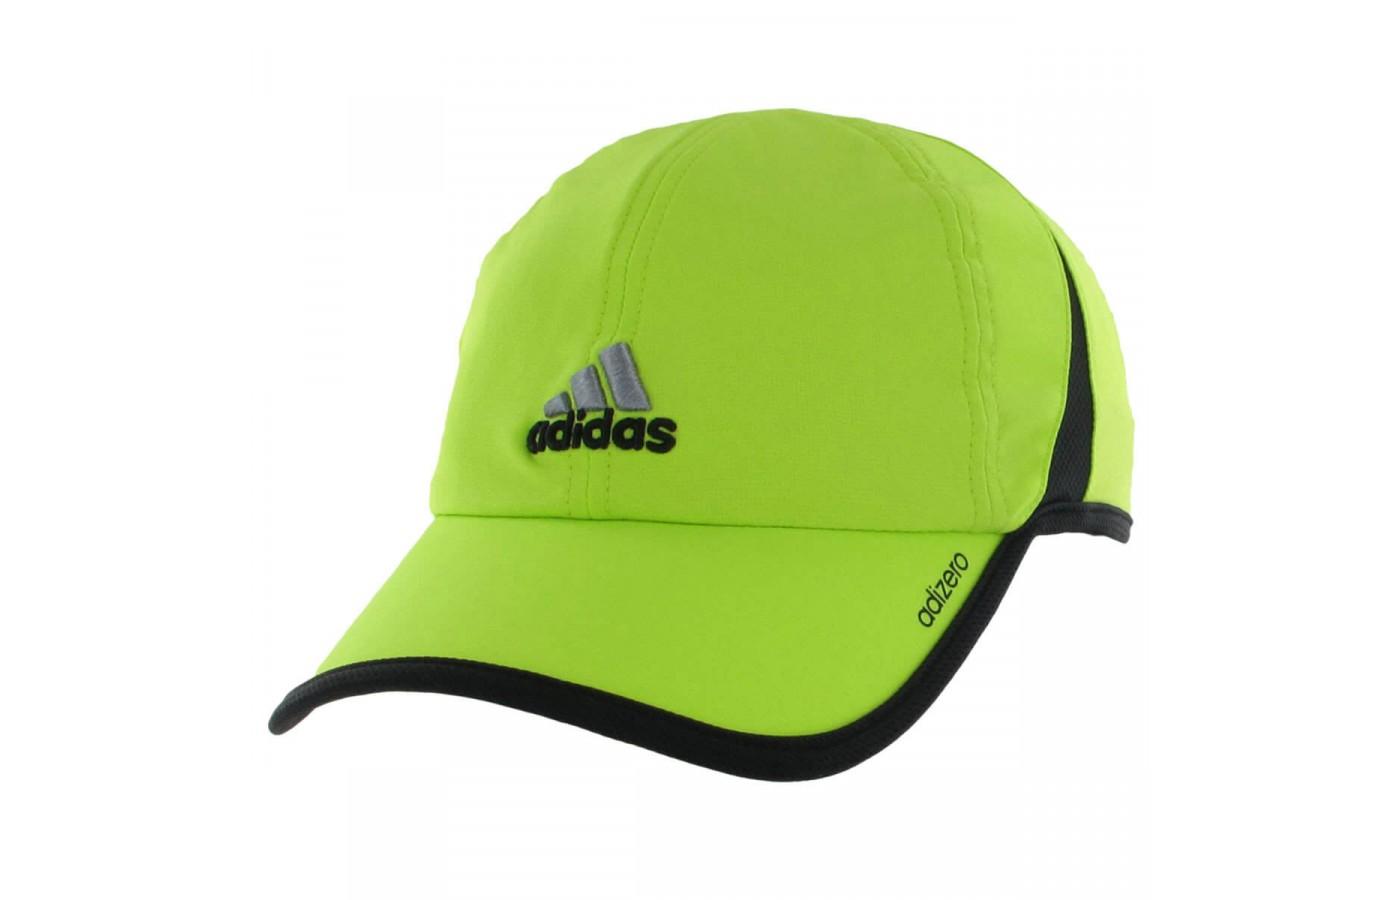 Adidas Adizero II Cap angle